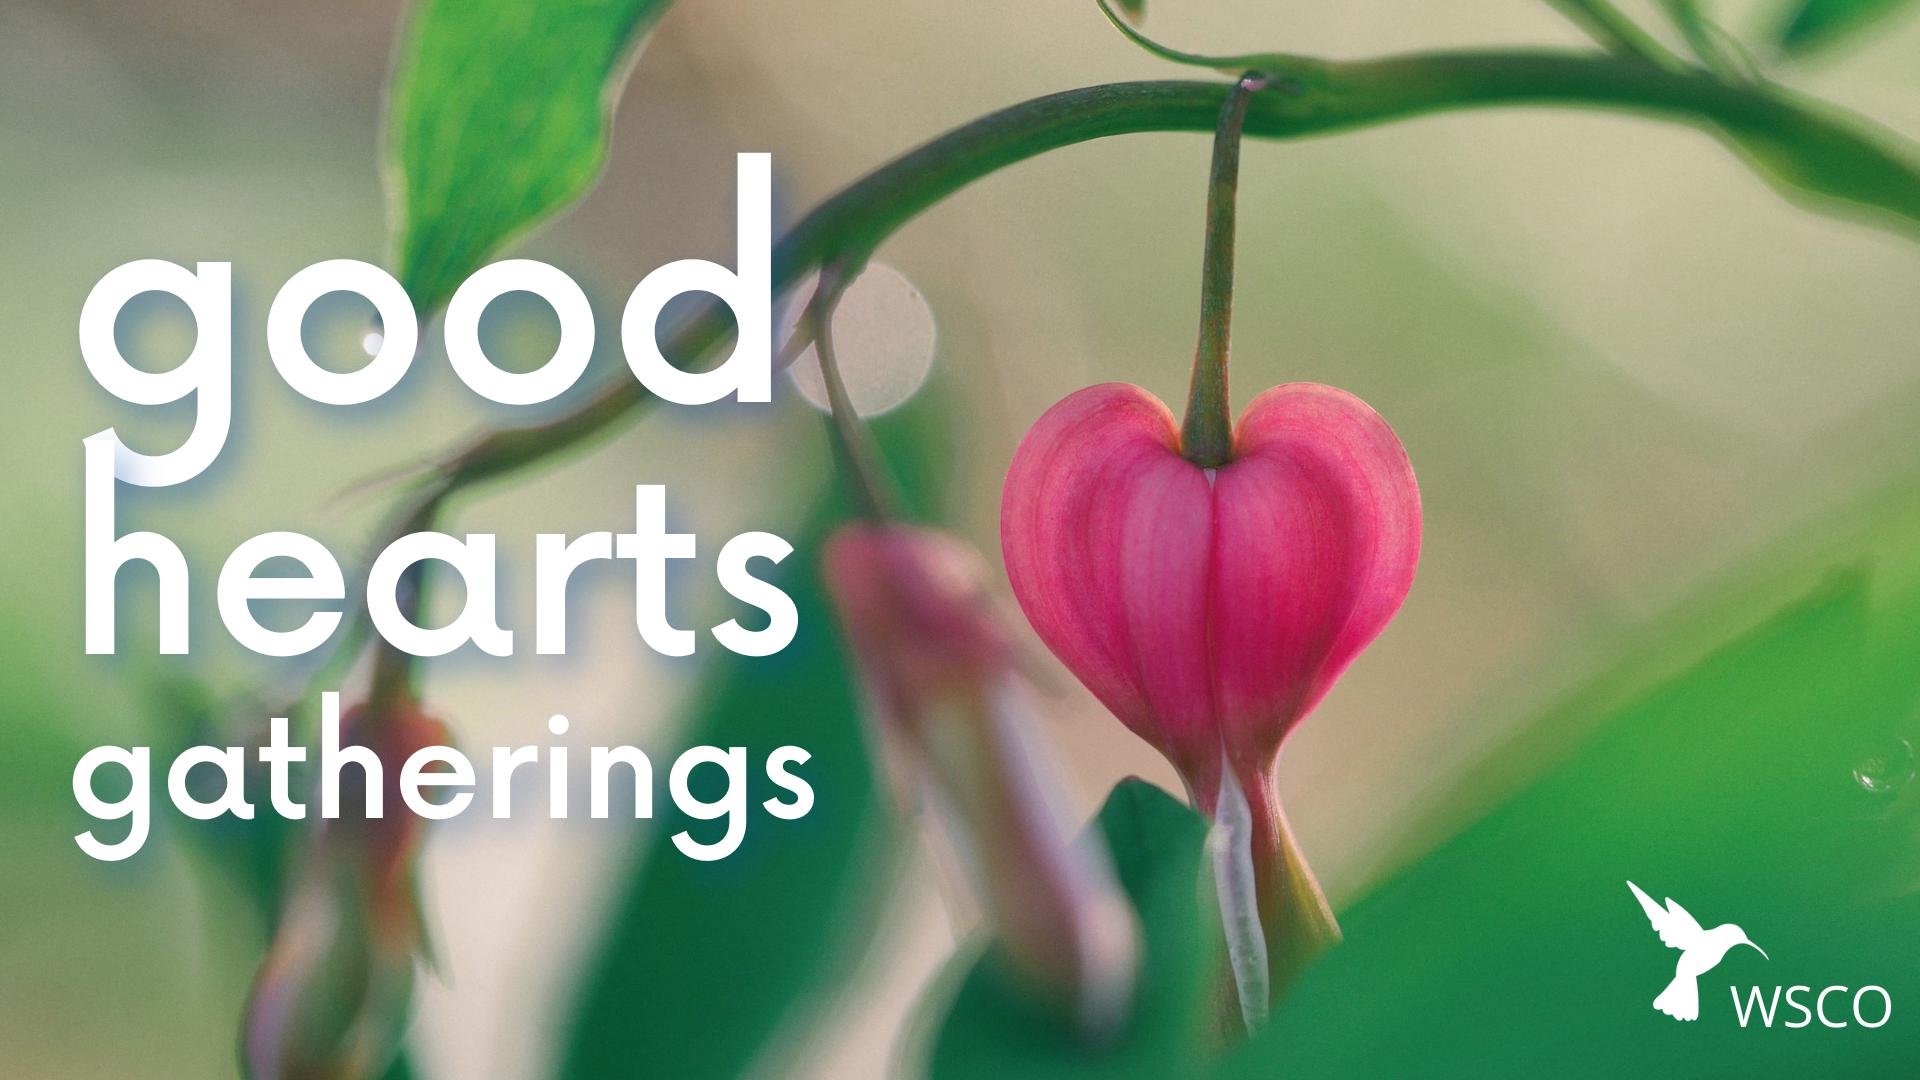 good hearts gatherings